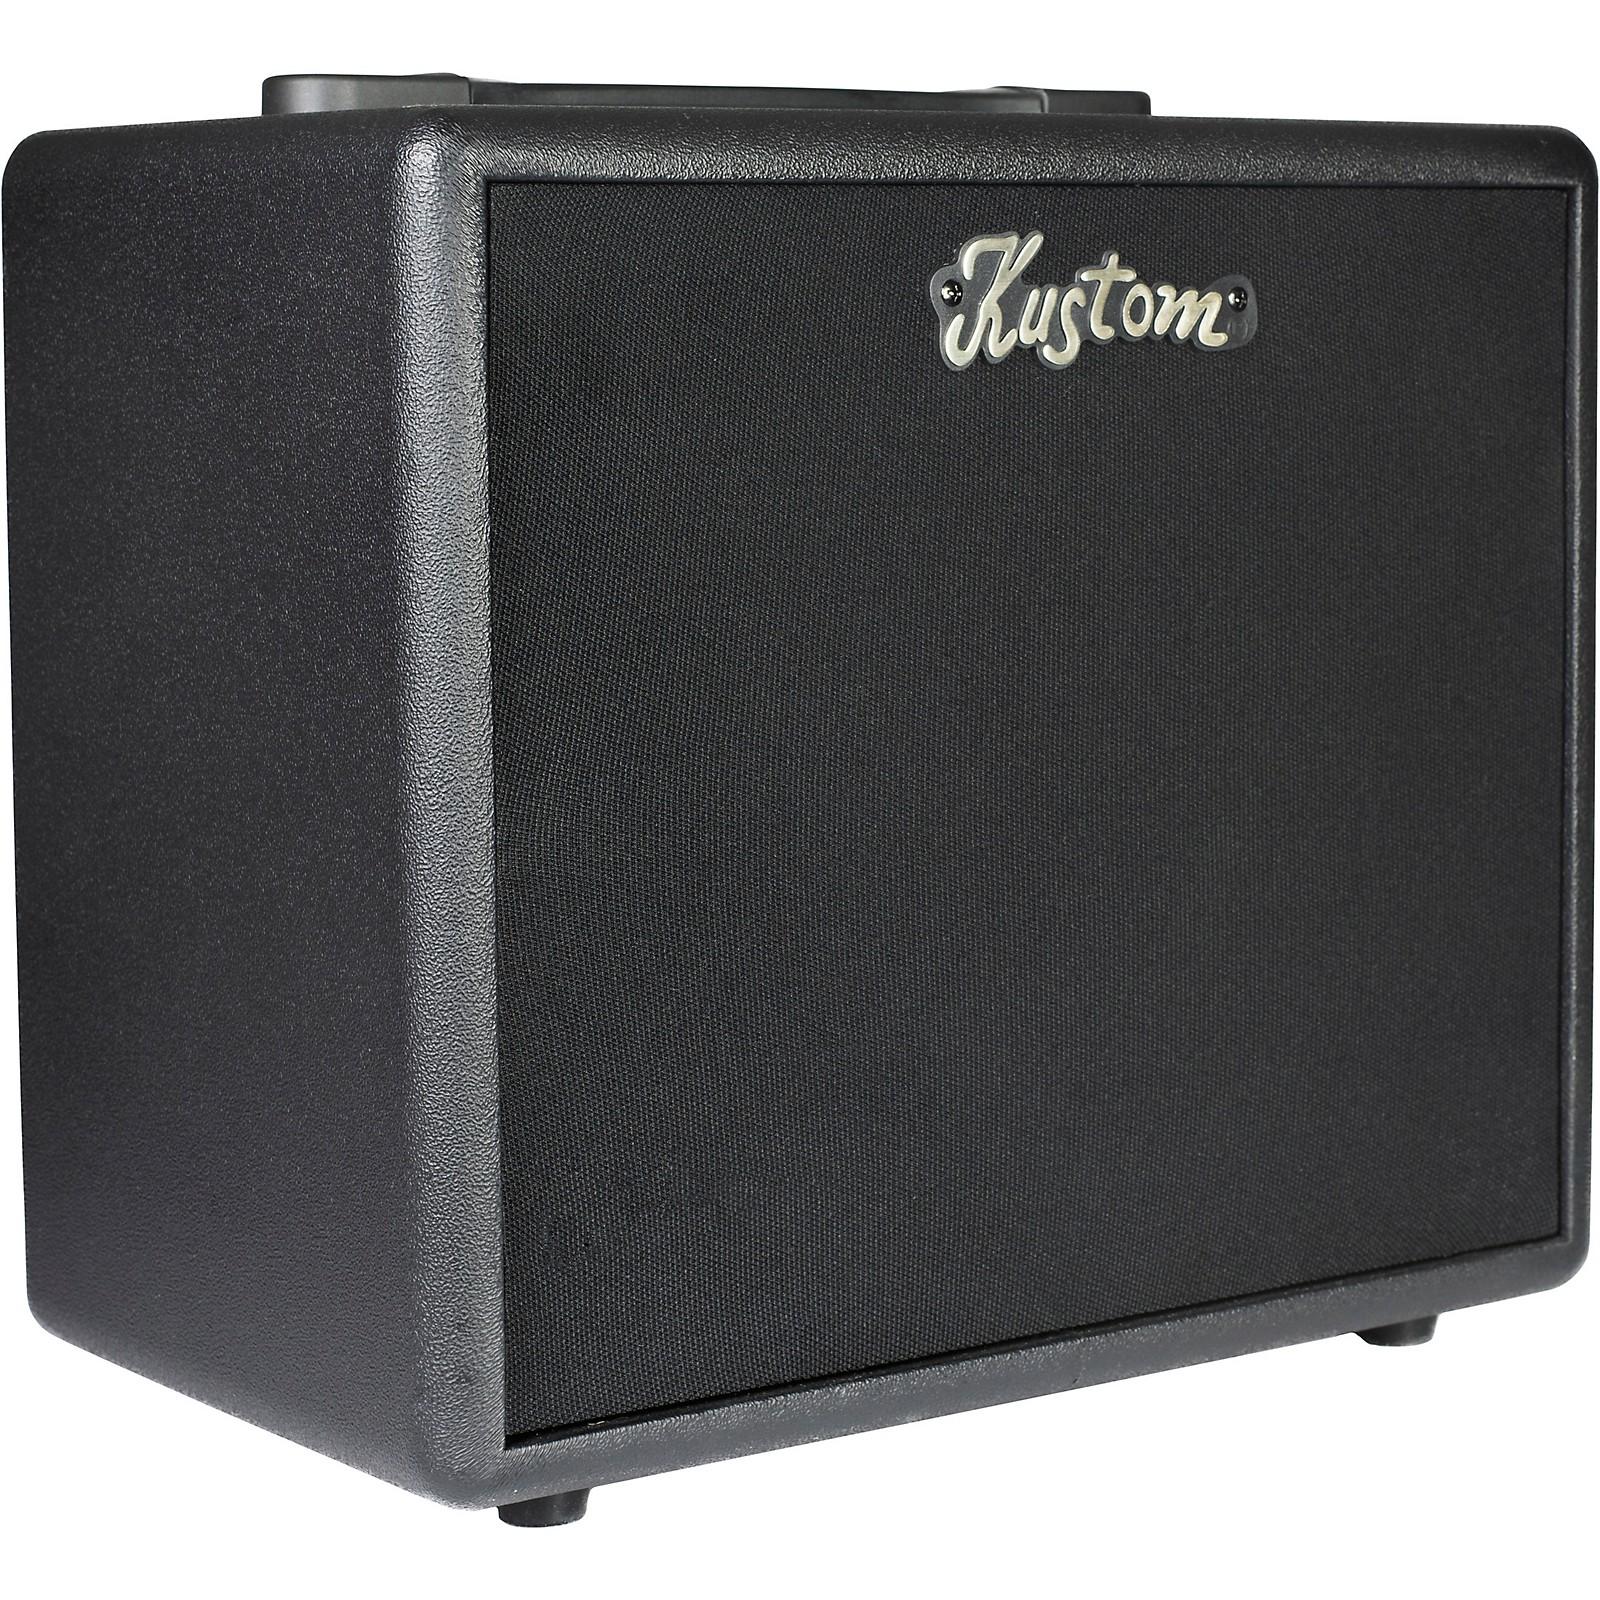 Kustom MOD-L20 20W 1x8 Guitar Combo Amplifier